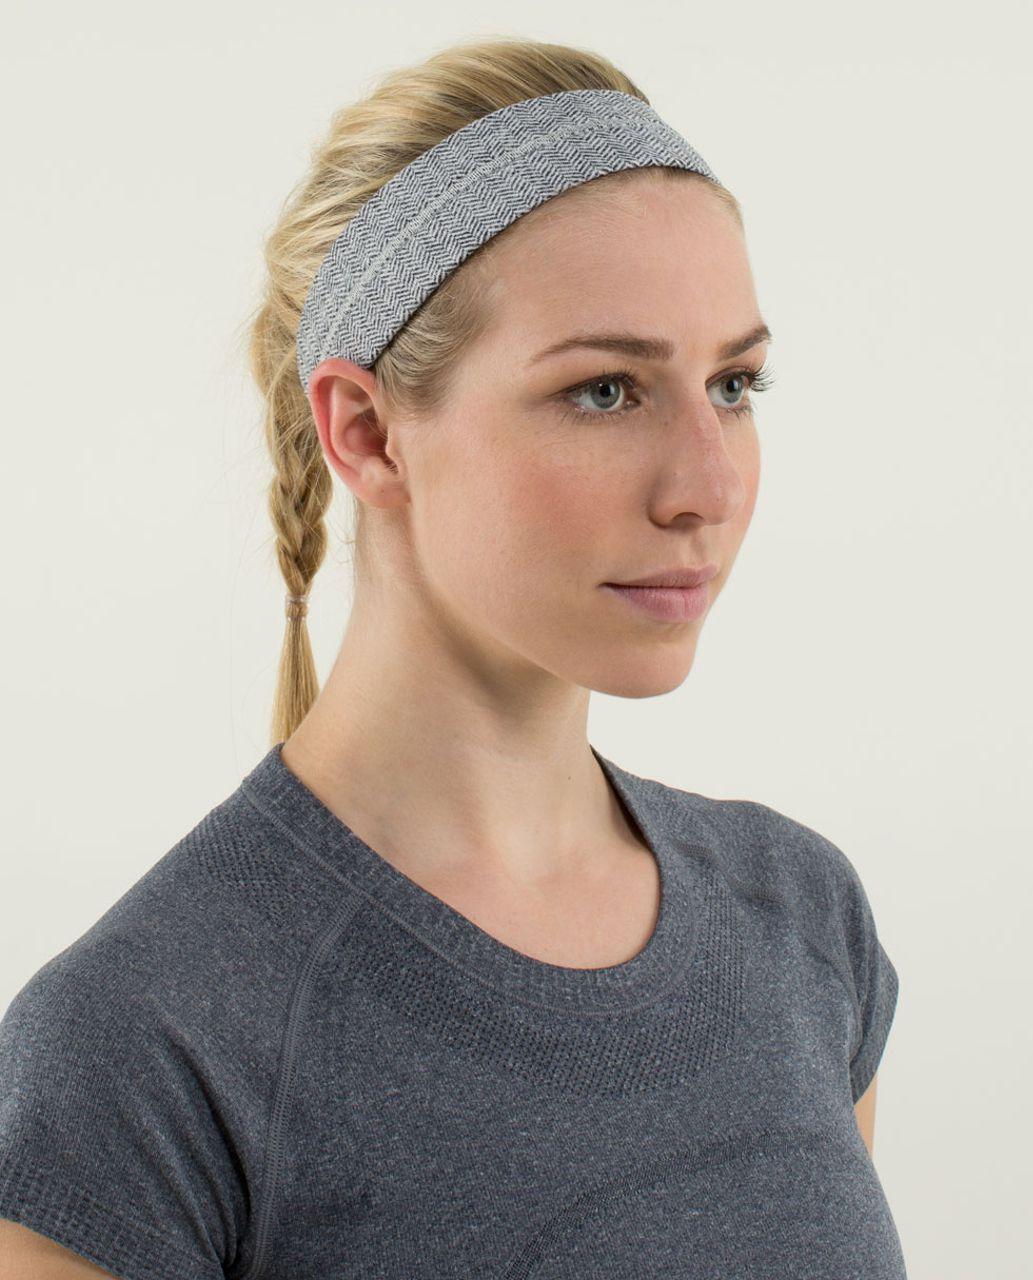 Lululemon Fly Away Tamer Headband - Heathered Herringbone Heathered Black White